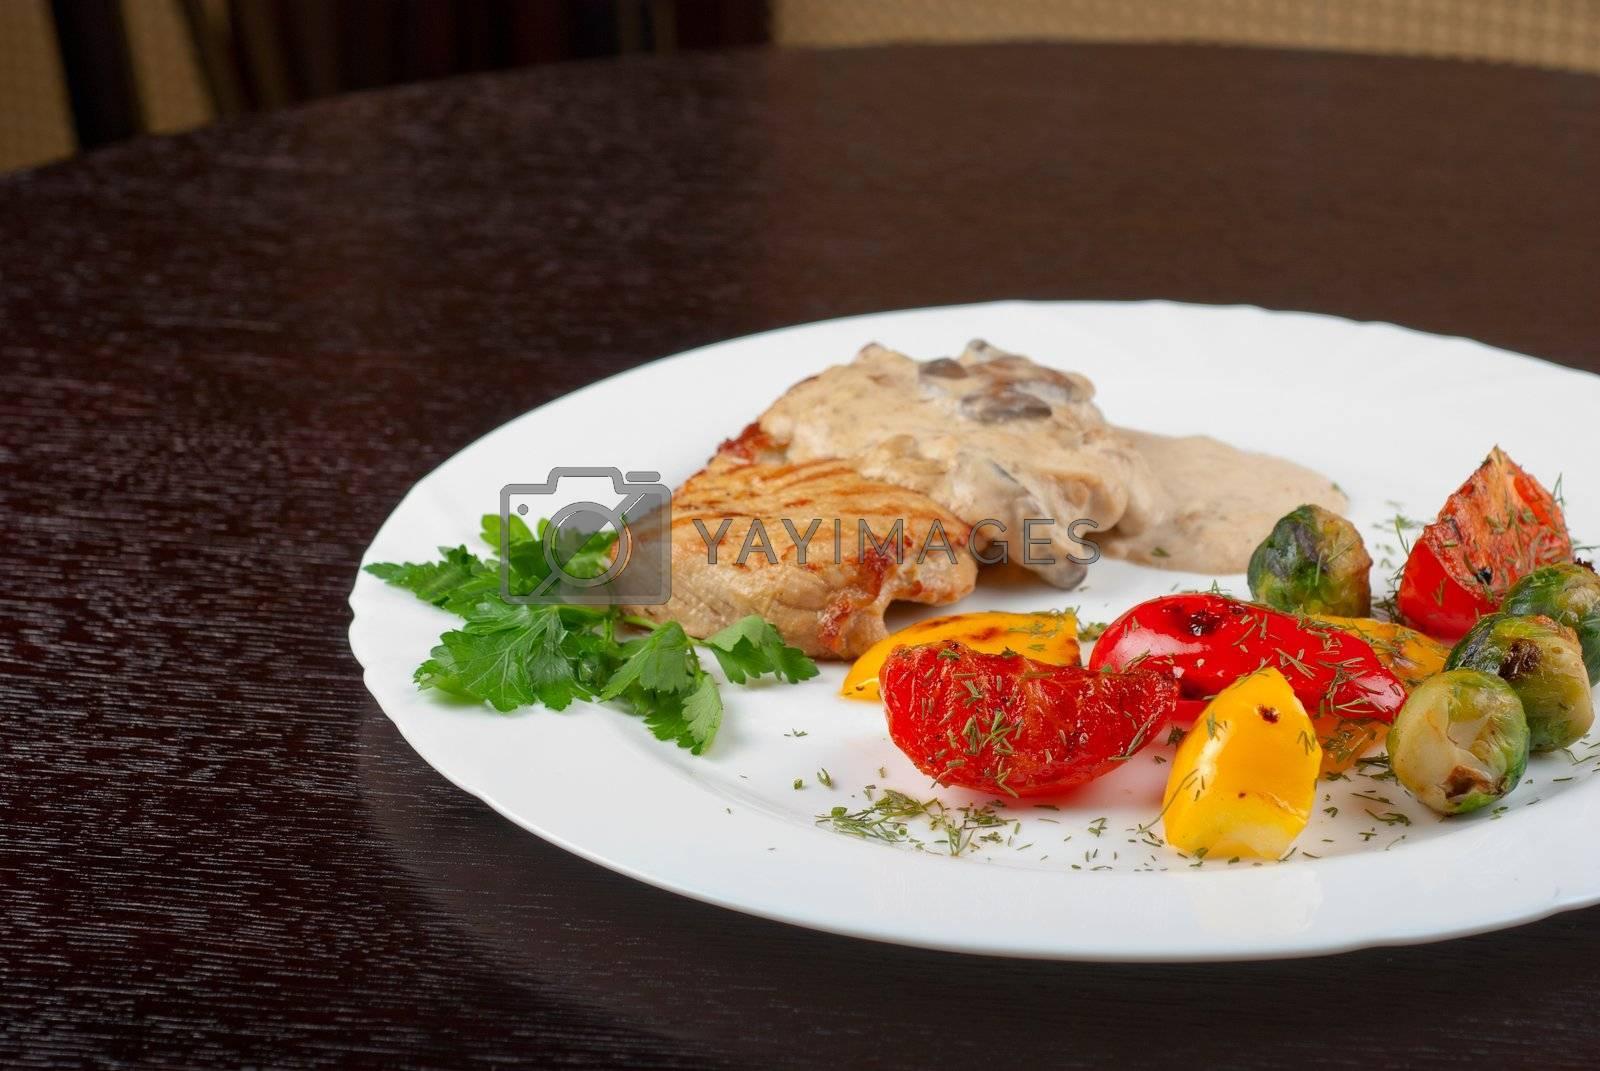 pork steak with mushroom sauce and grilled vegetables